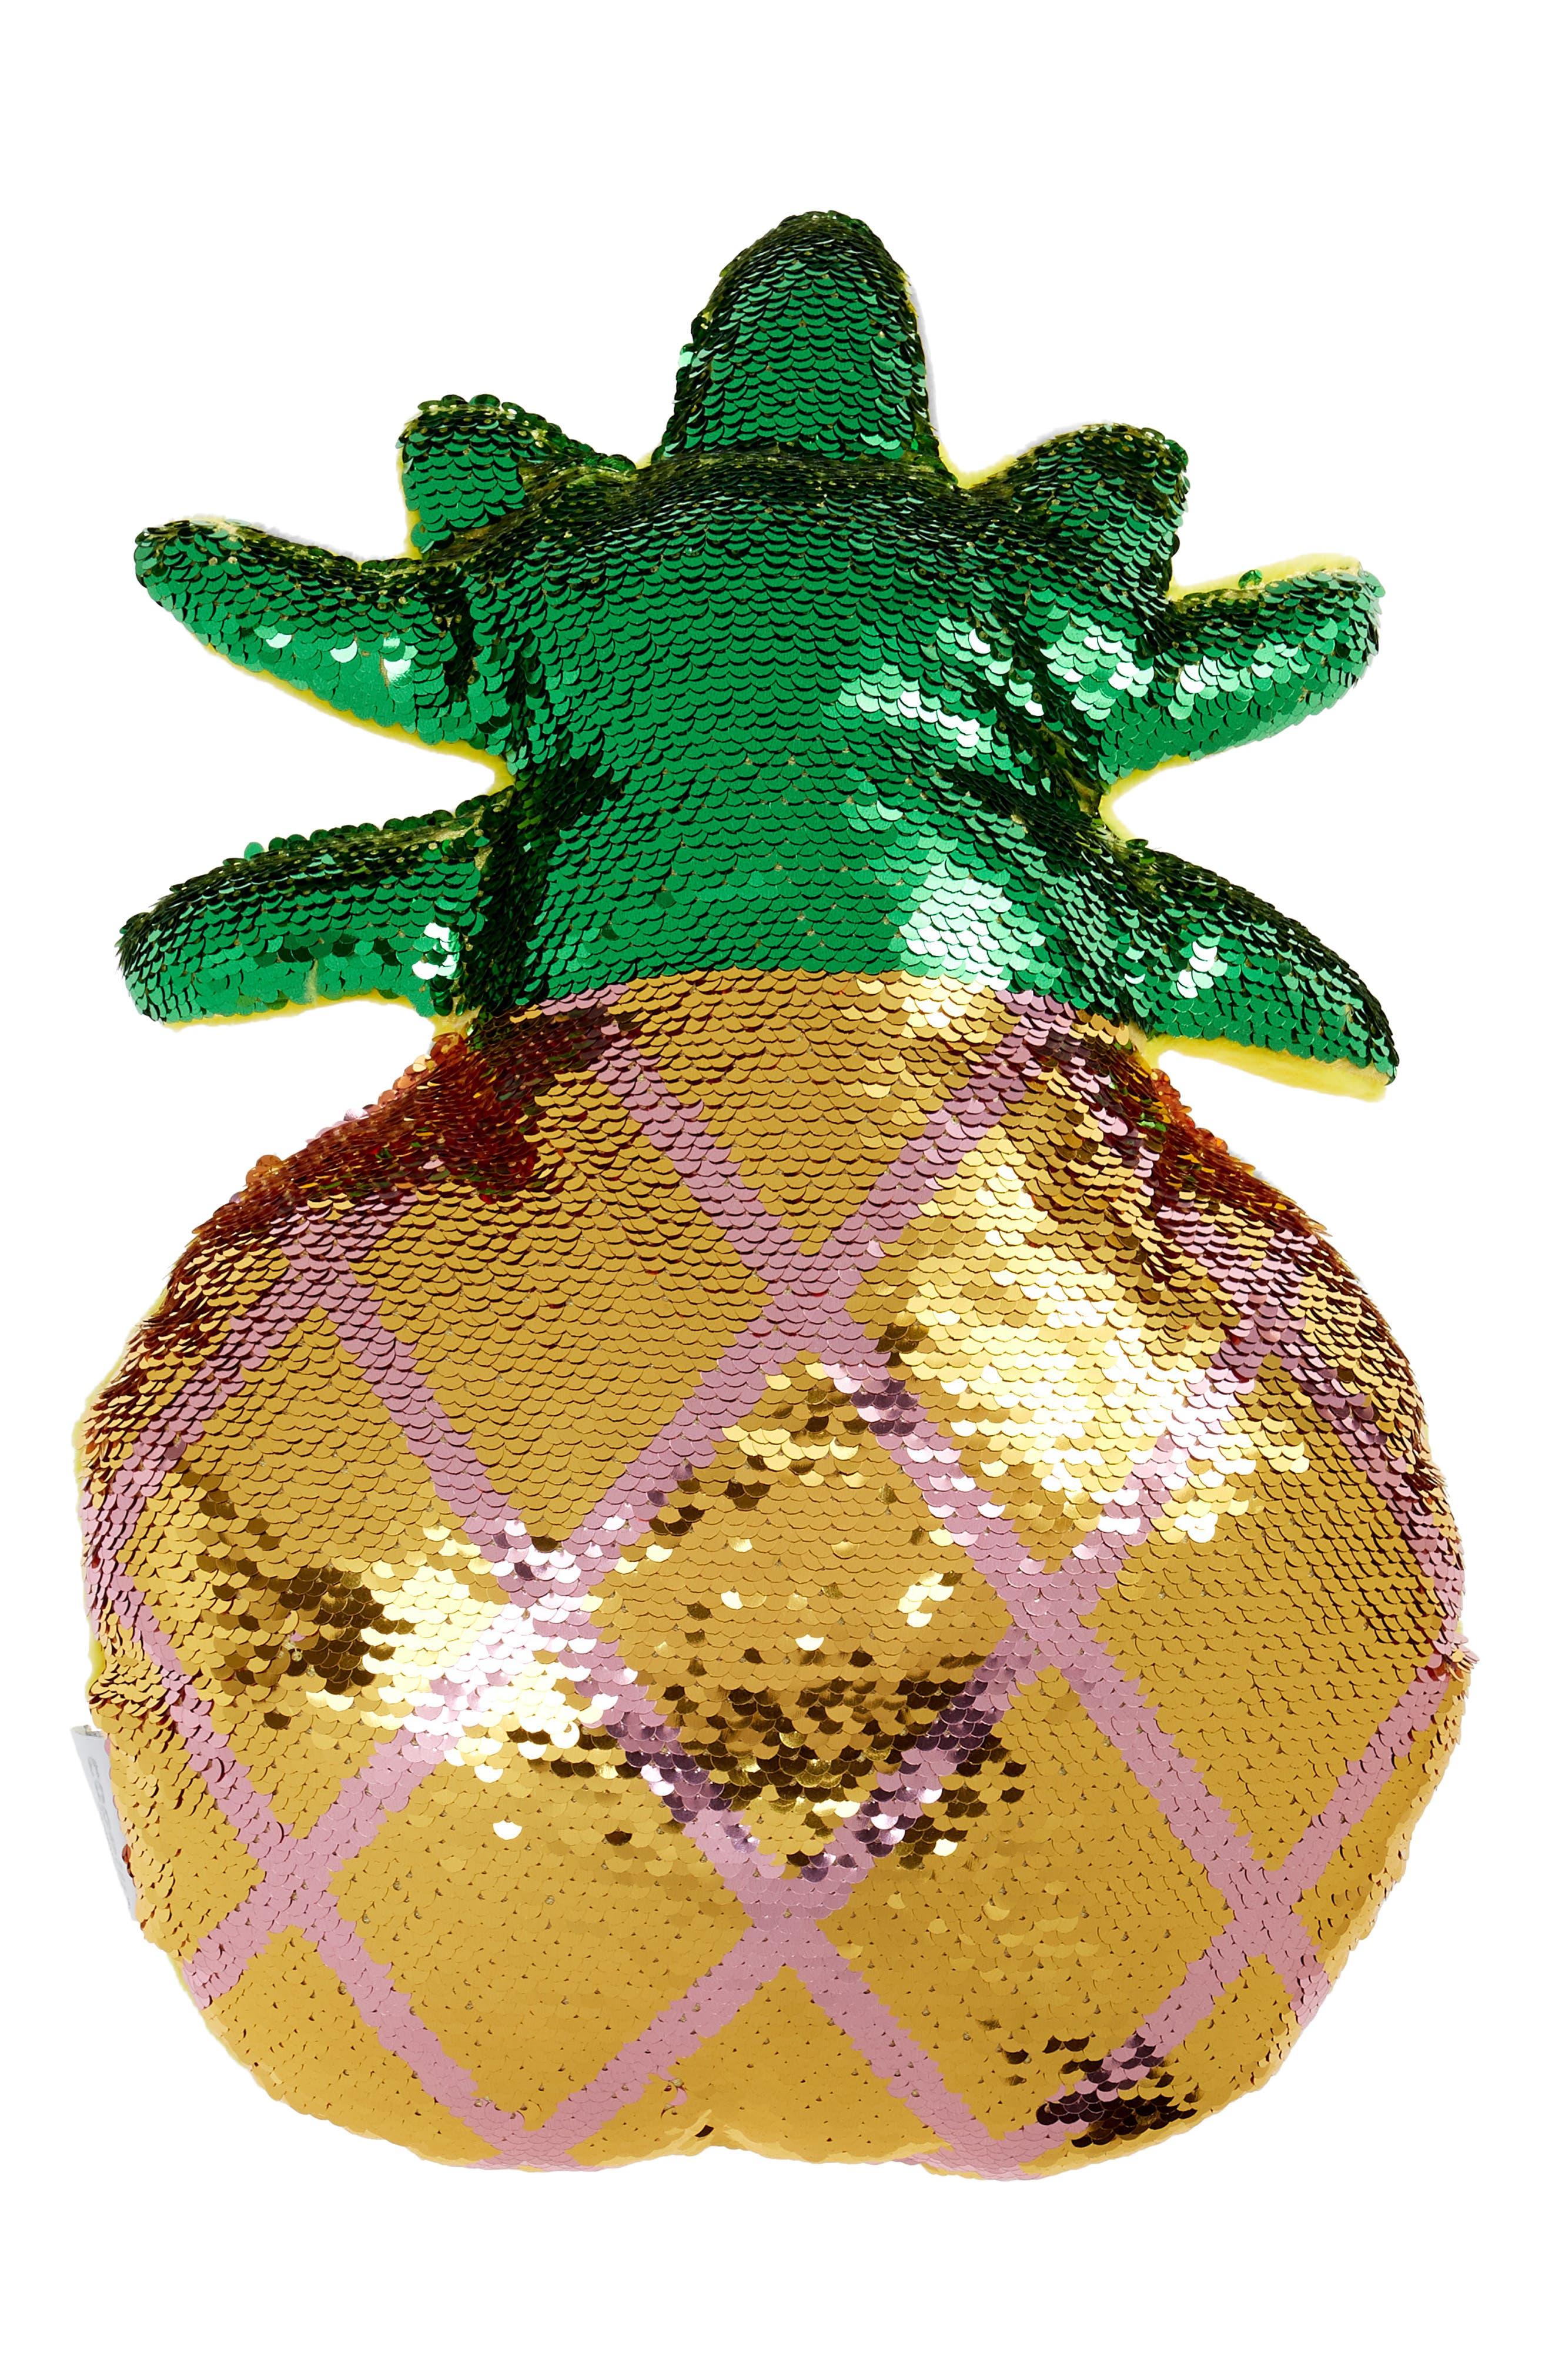 Flip Sequin Pineapple Pillow,                             Main thumbnail 1, color,                             Gold Combo